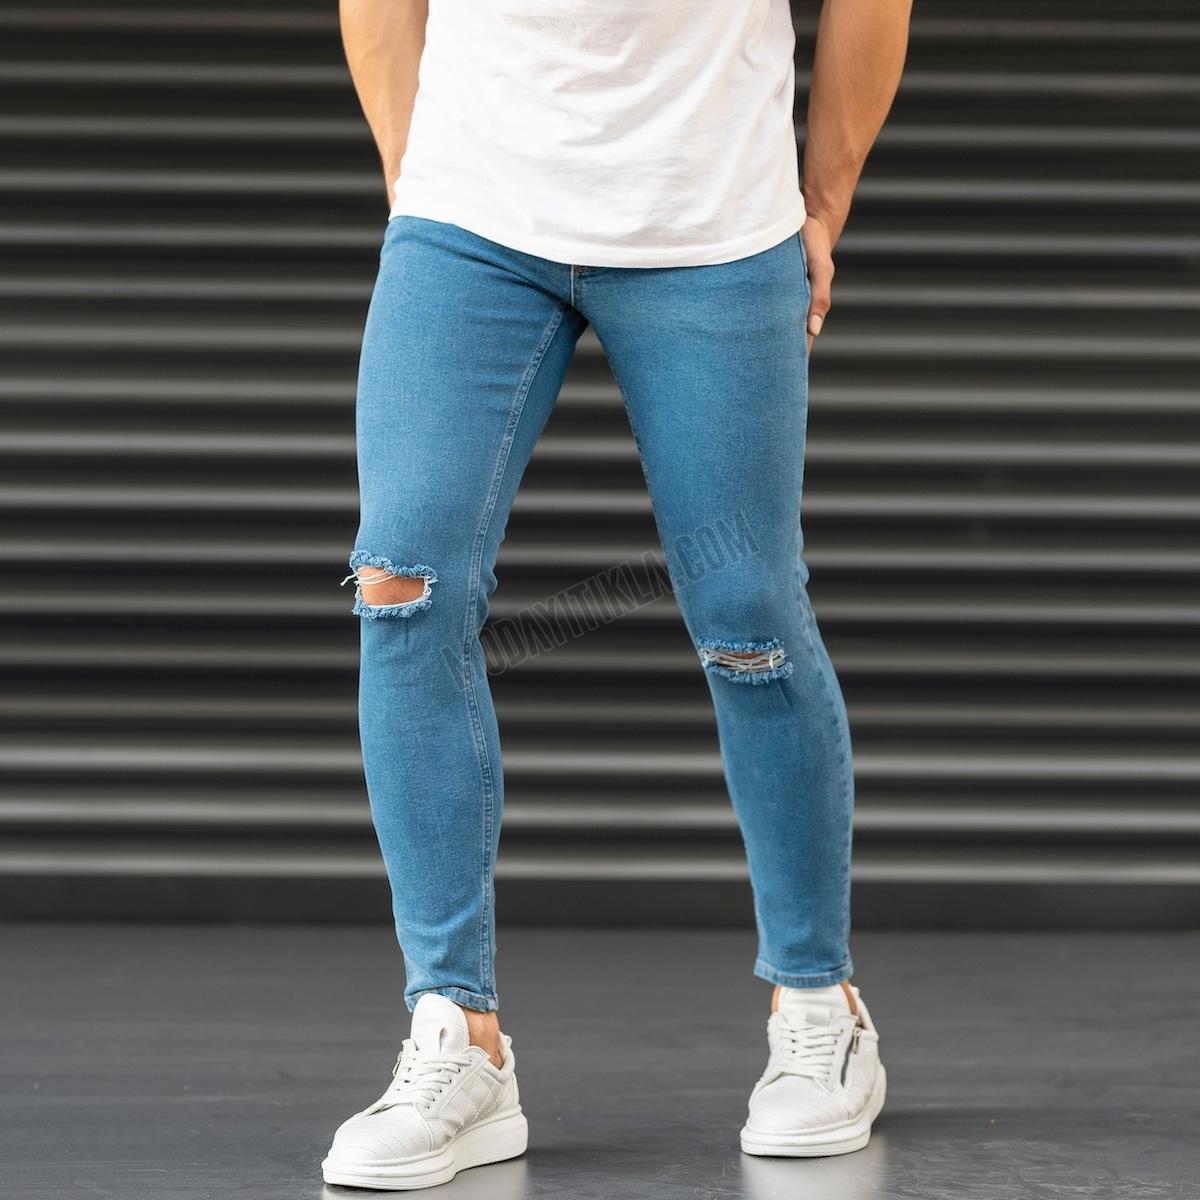 Erkek Dizi Yırtık Dar Paça Fit Mavi Kot Pantolon